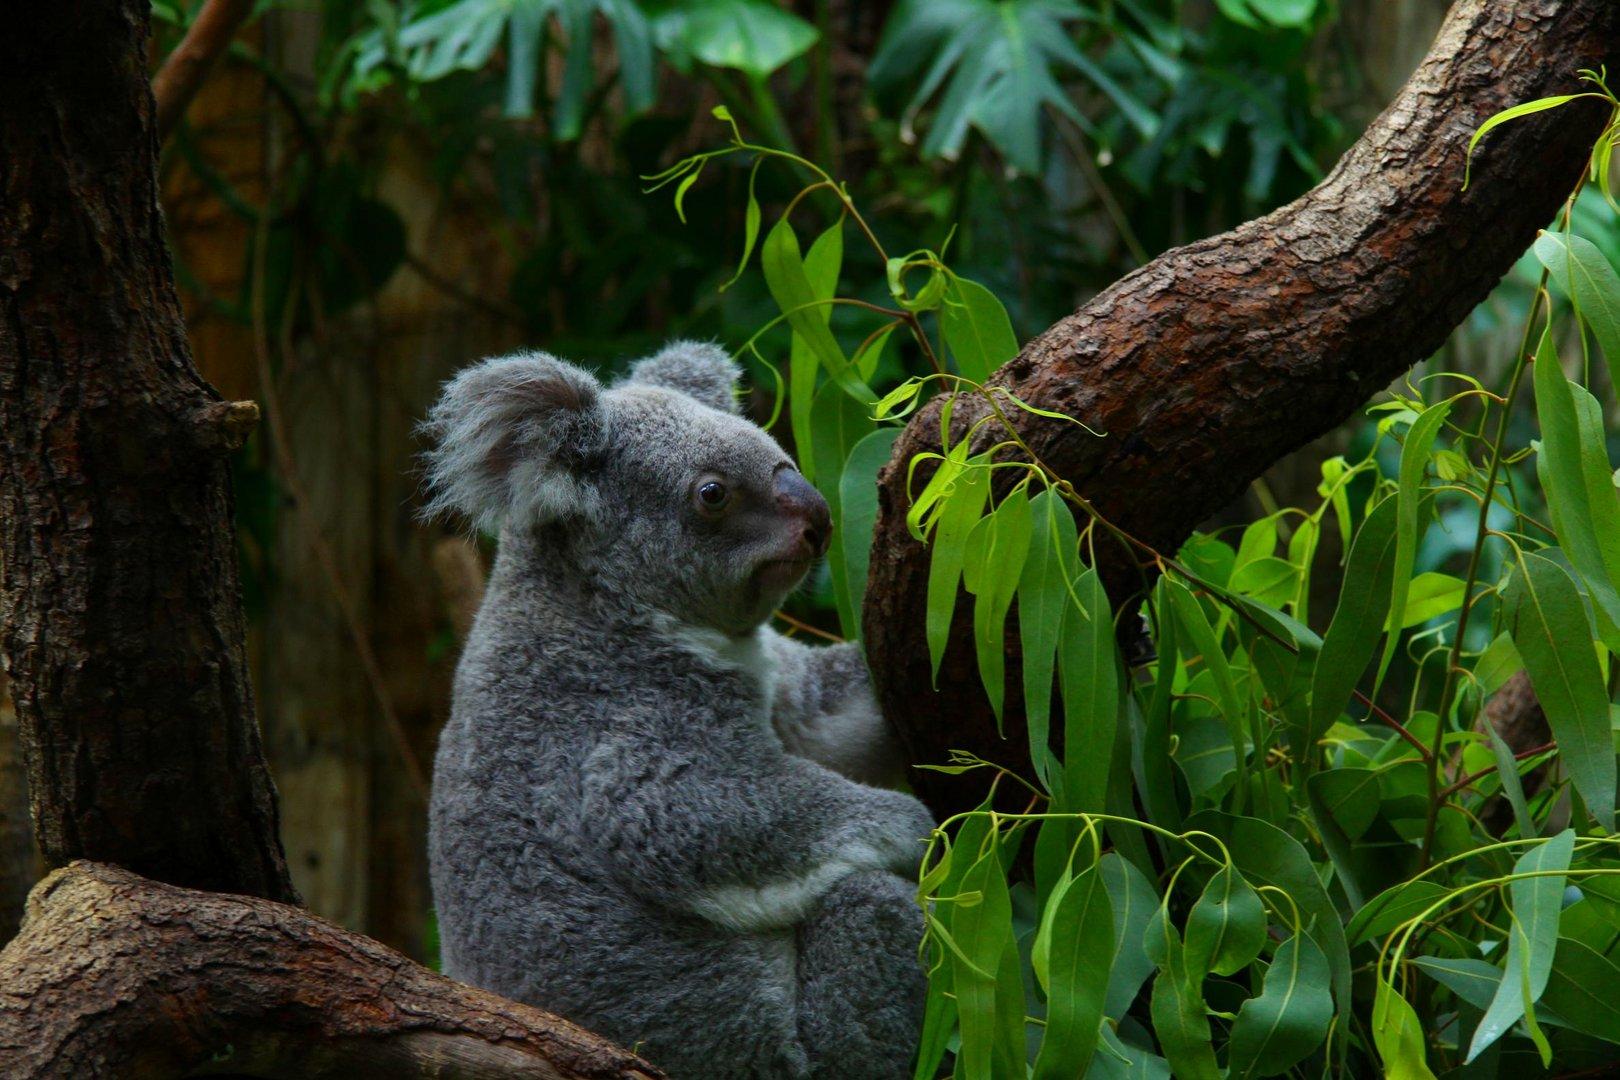 Koala im Duisburger Zoo